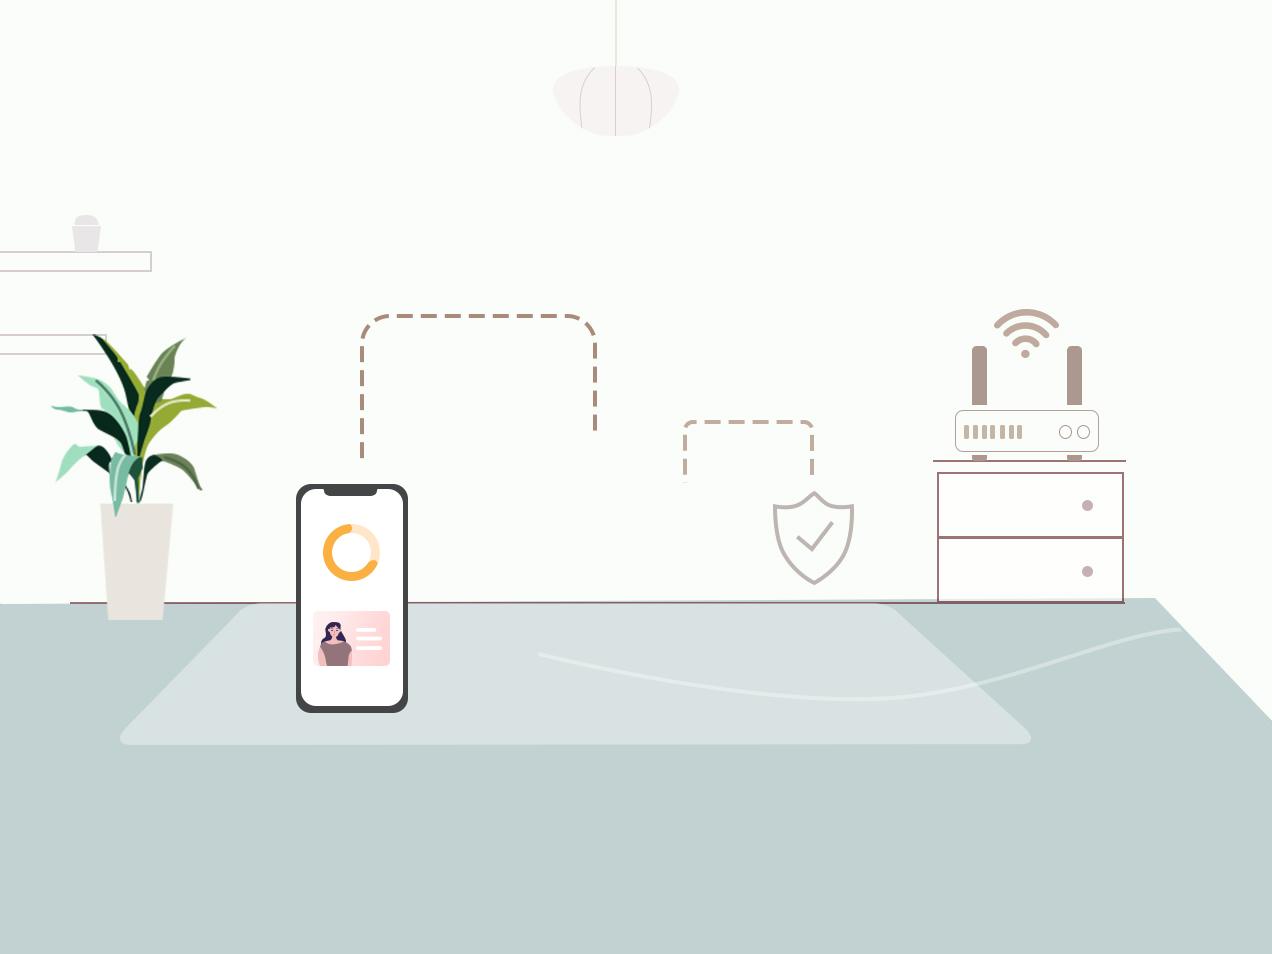 AnyTrans for iOS 破解版 优秀的iPhone/iPad设备管理工具-麦氪派(WaitsUn.com | 爱情守望者)